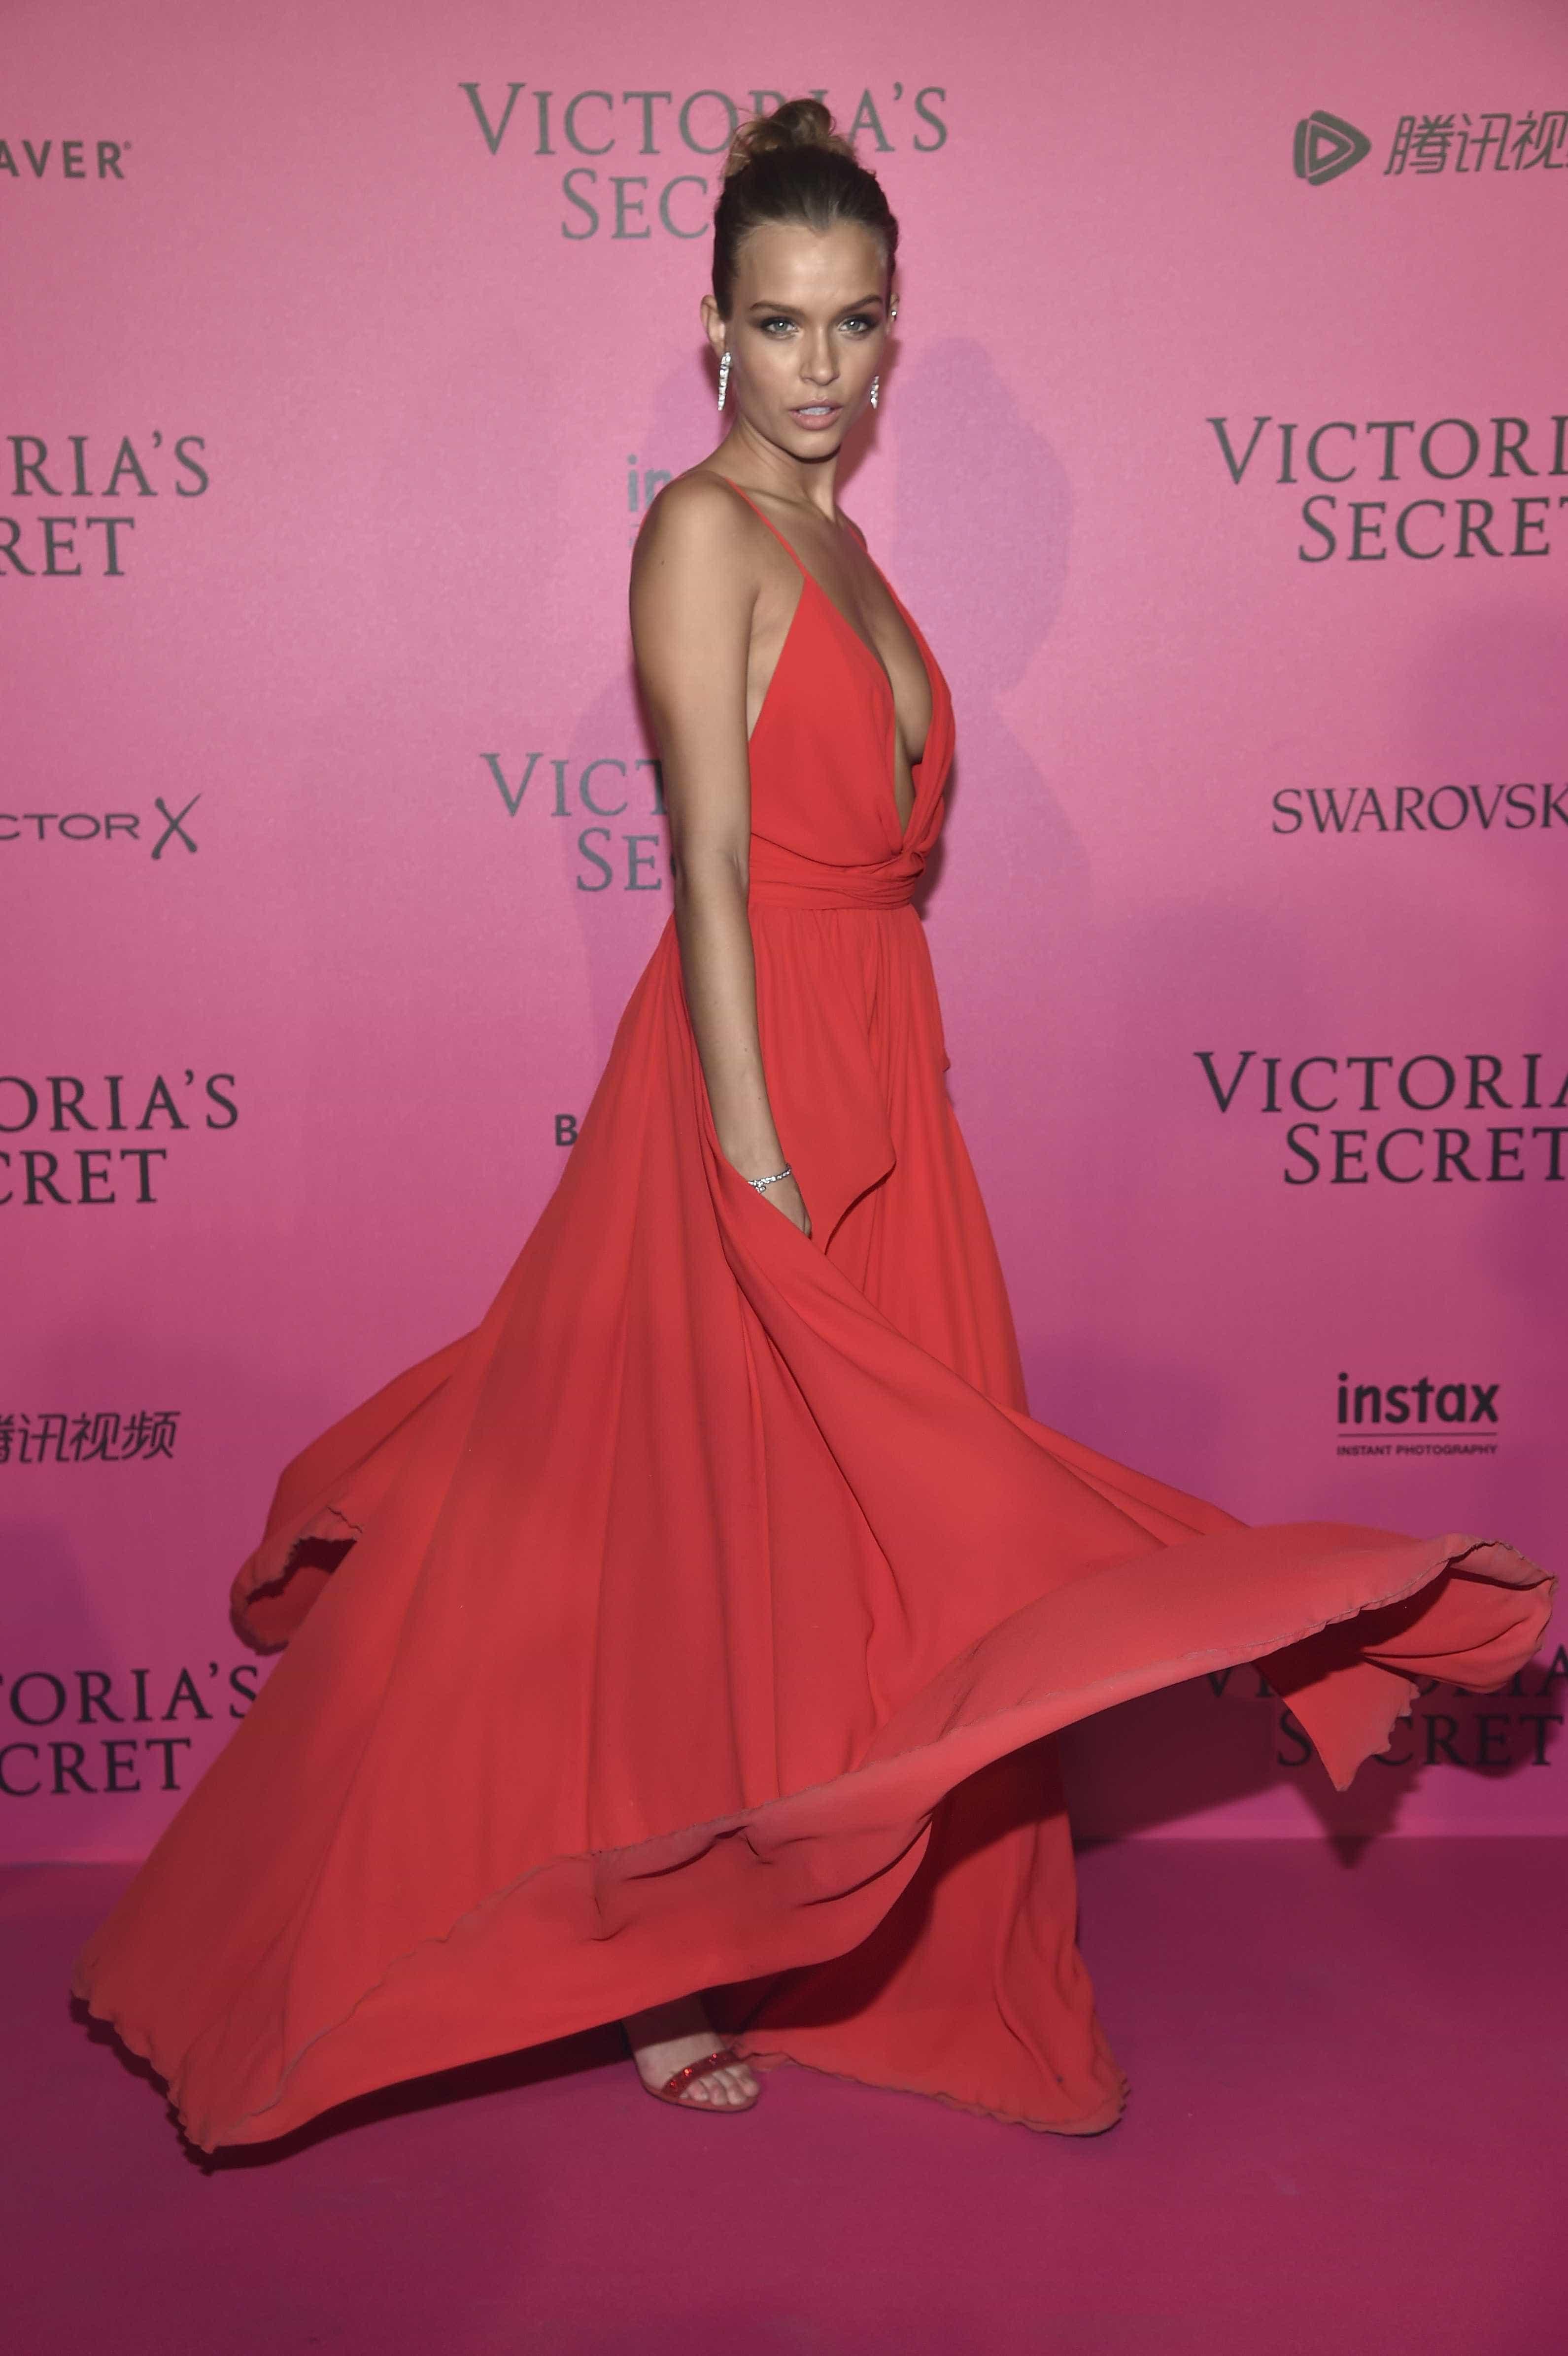 Os 'looks' na festa do desfile da Victoria's Secret